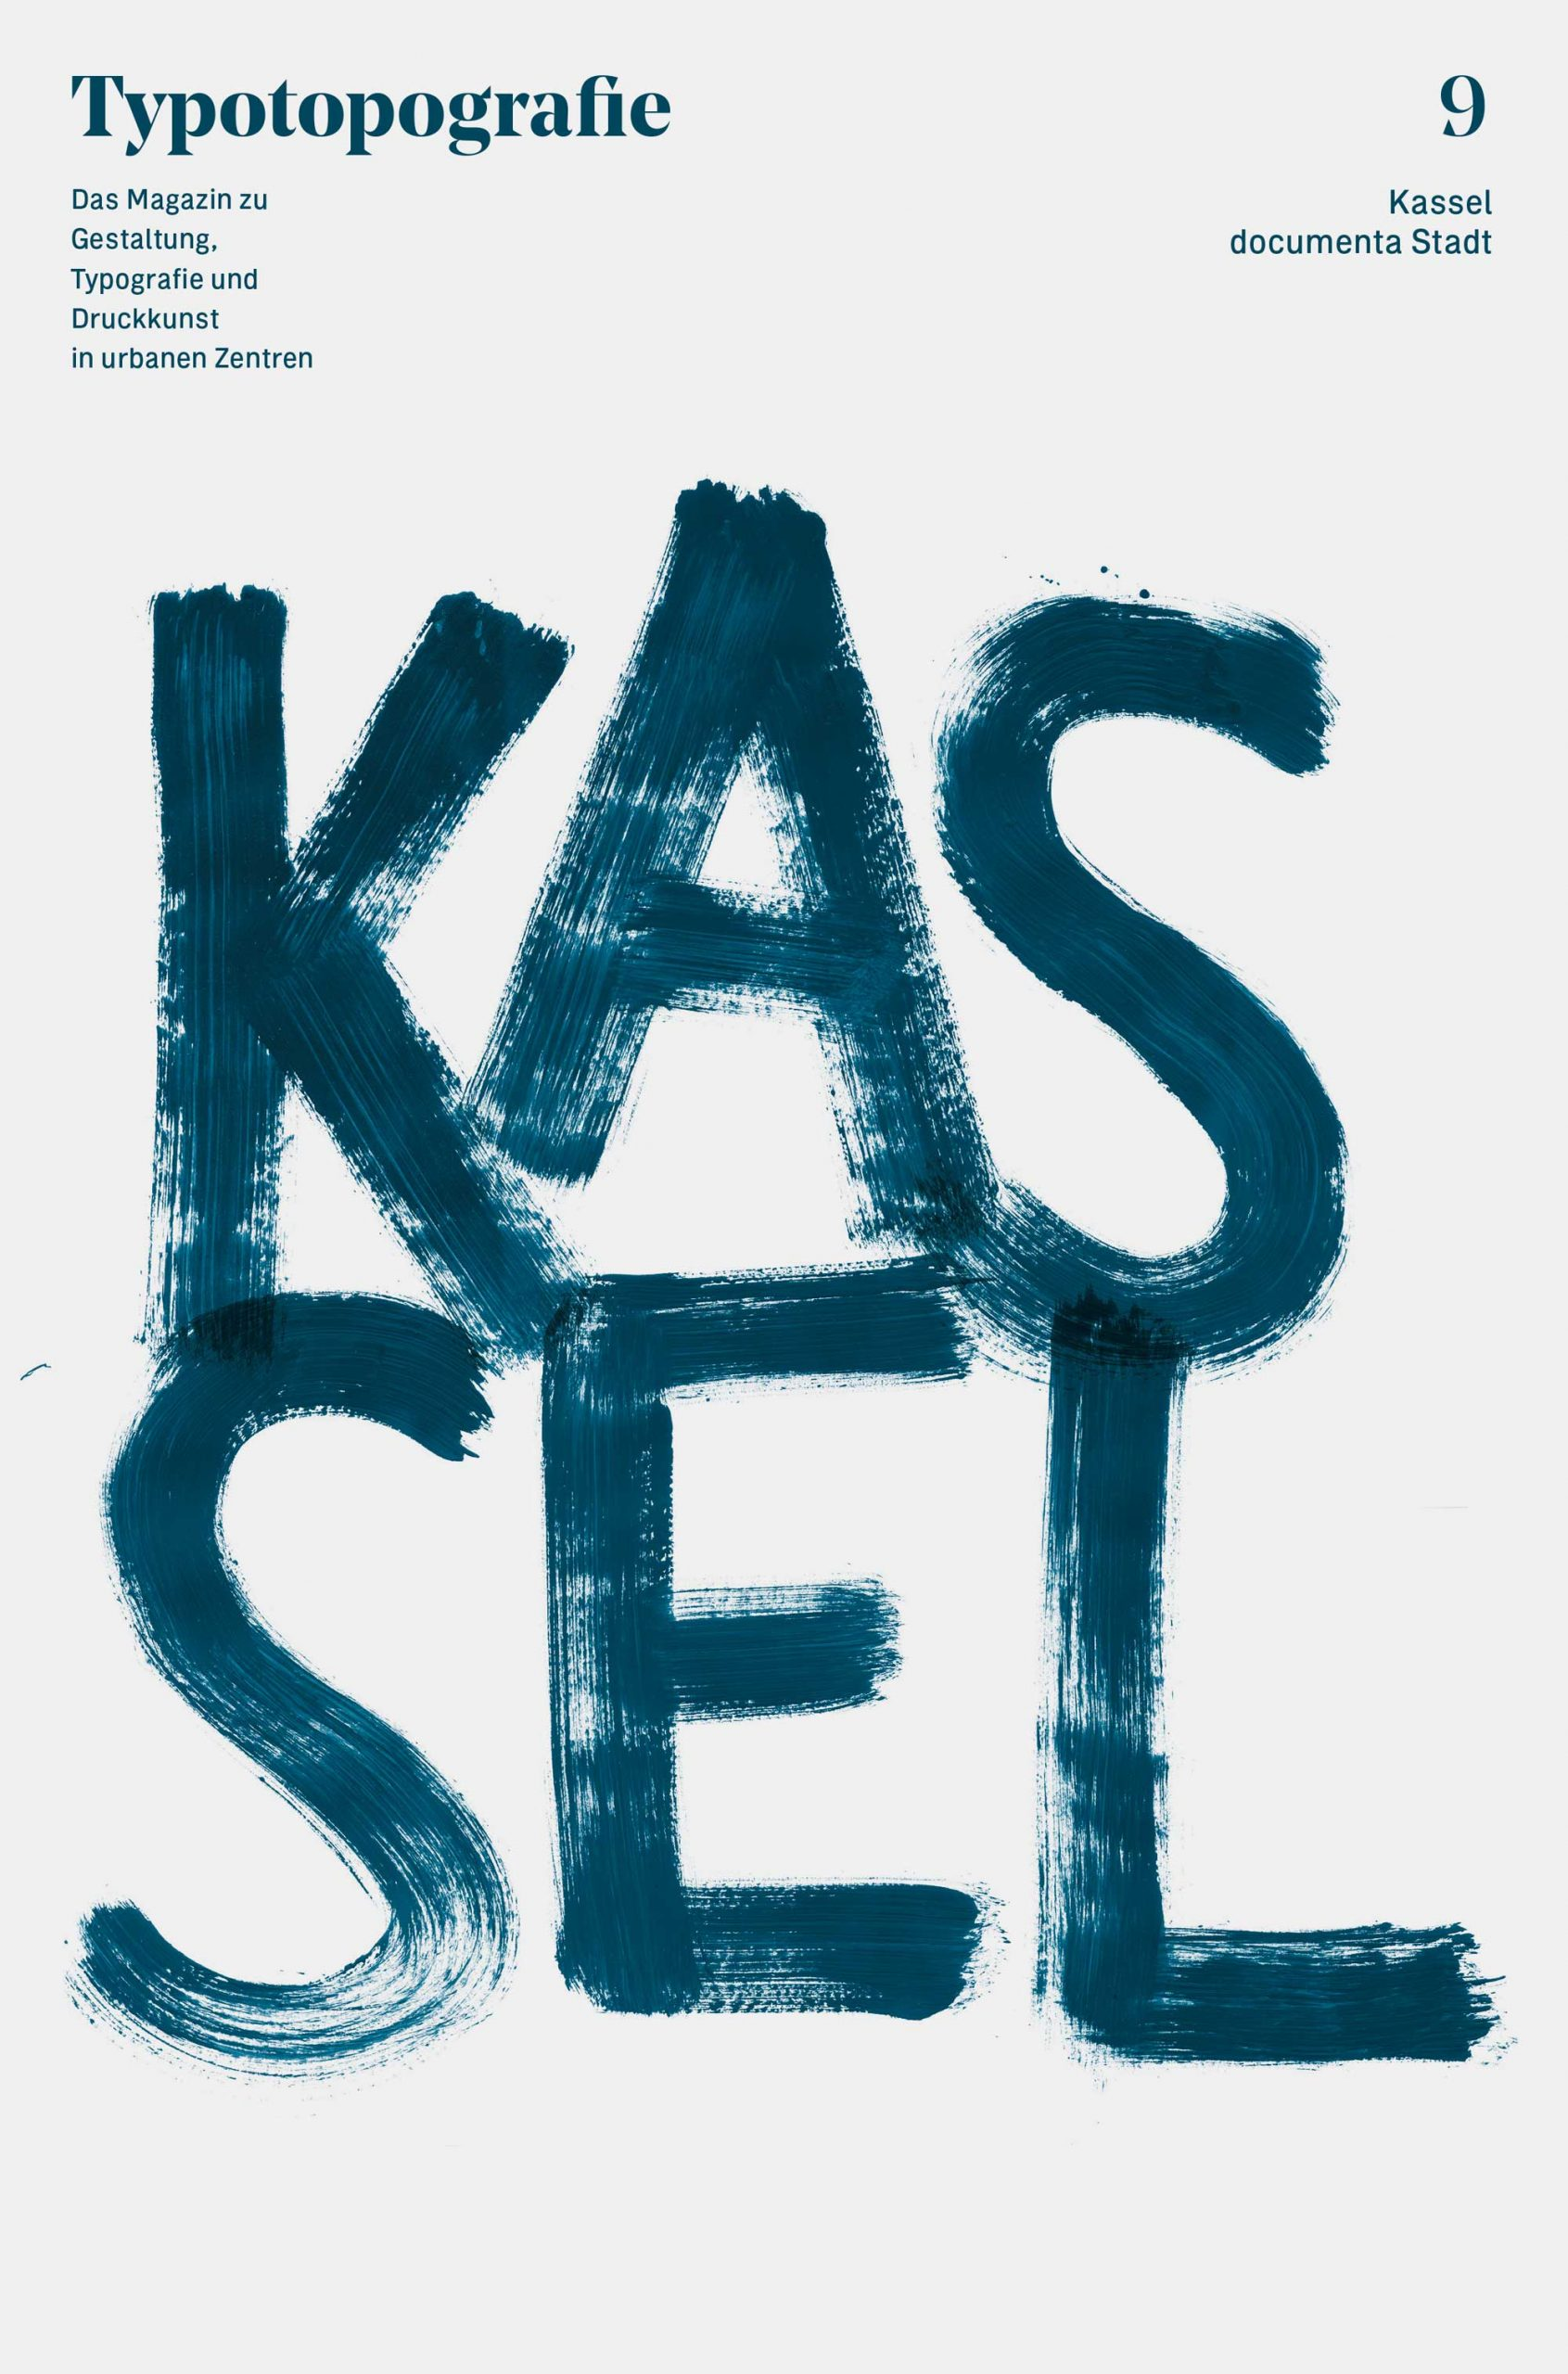 Typotopografie 9: Kassel